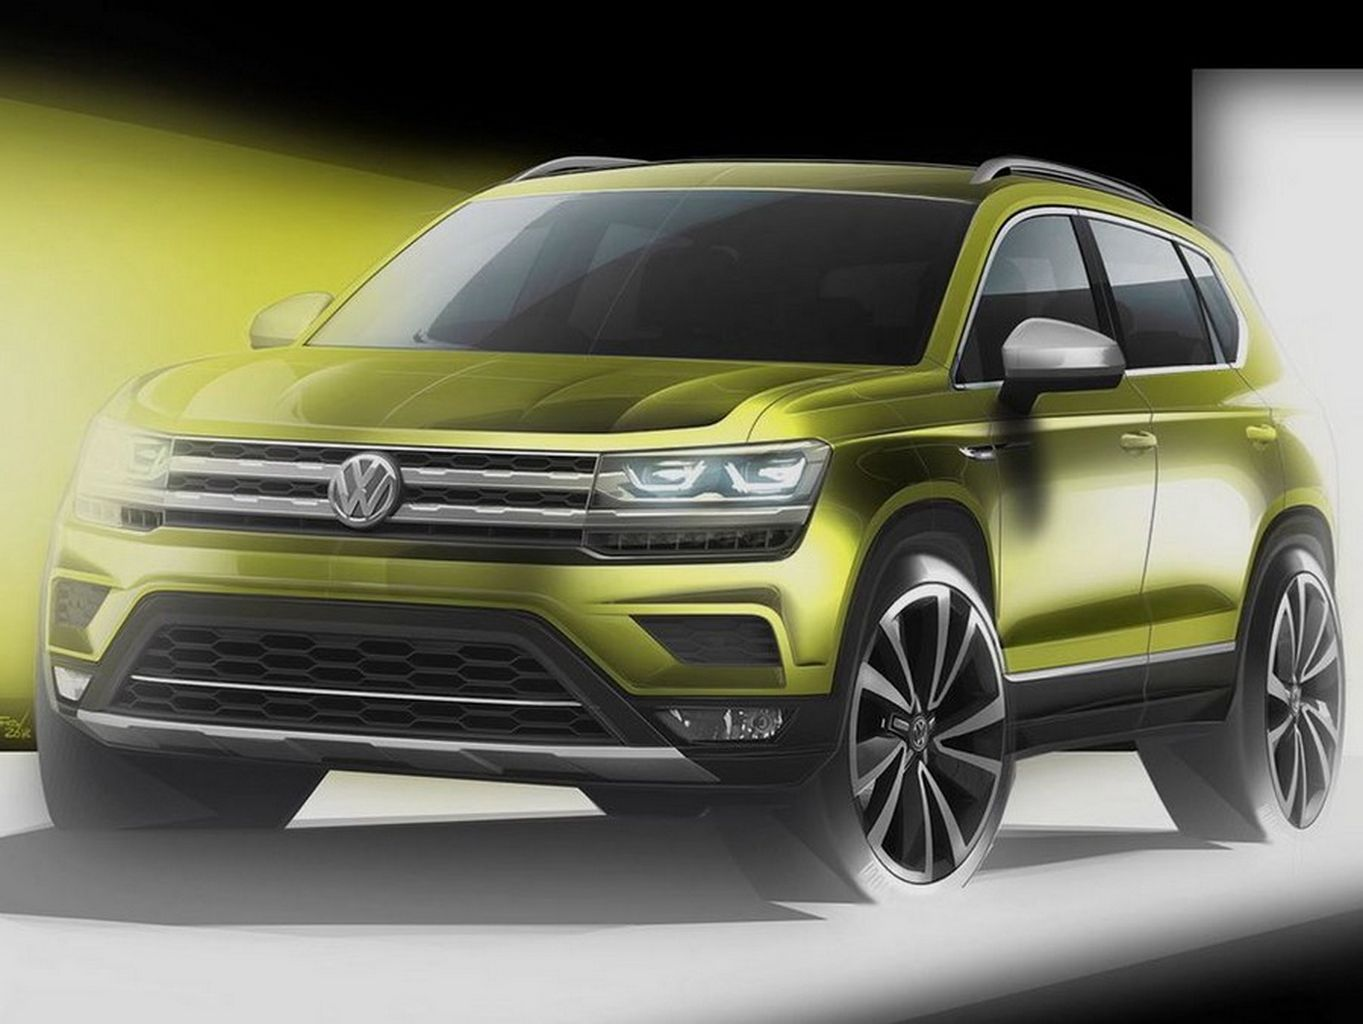 Volkswagen Tharu. Ou Tarek. O Volks-SUV